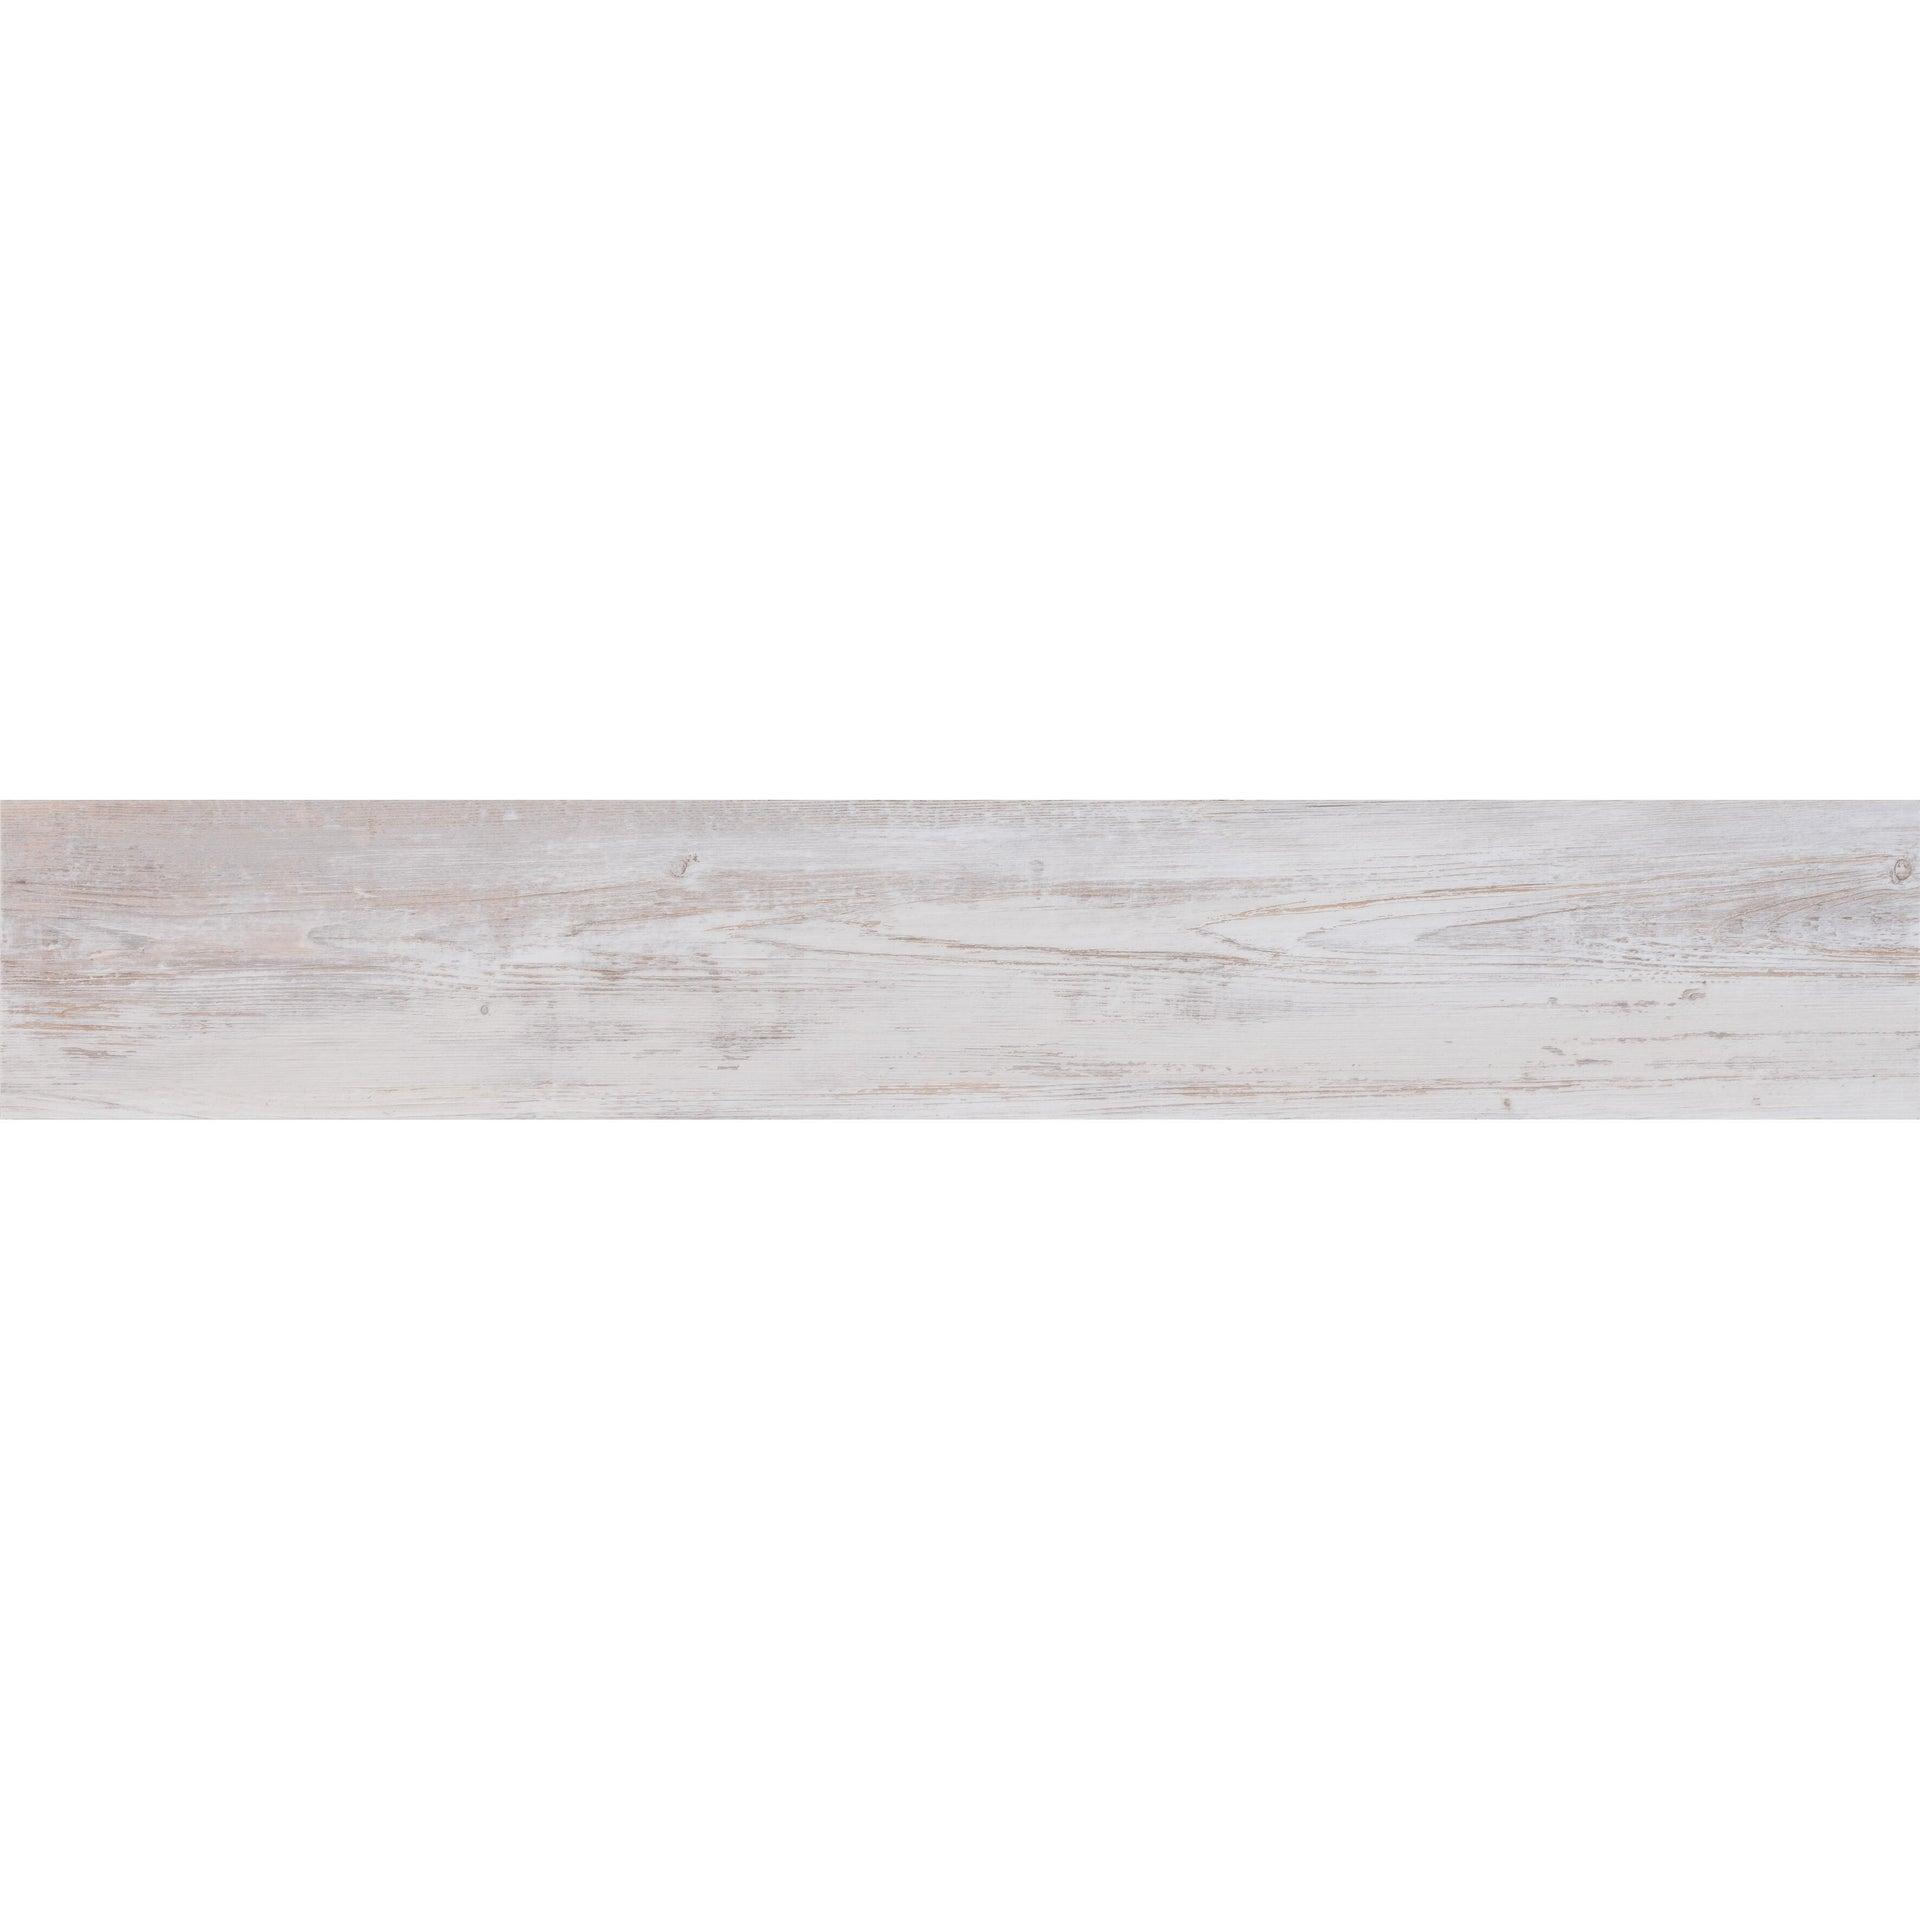 Pavimento PVC adesivo Senso Rustic Hielo Sp 2 mm bianco - 2